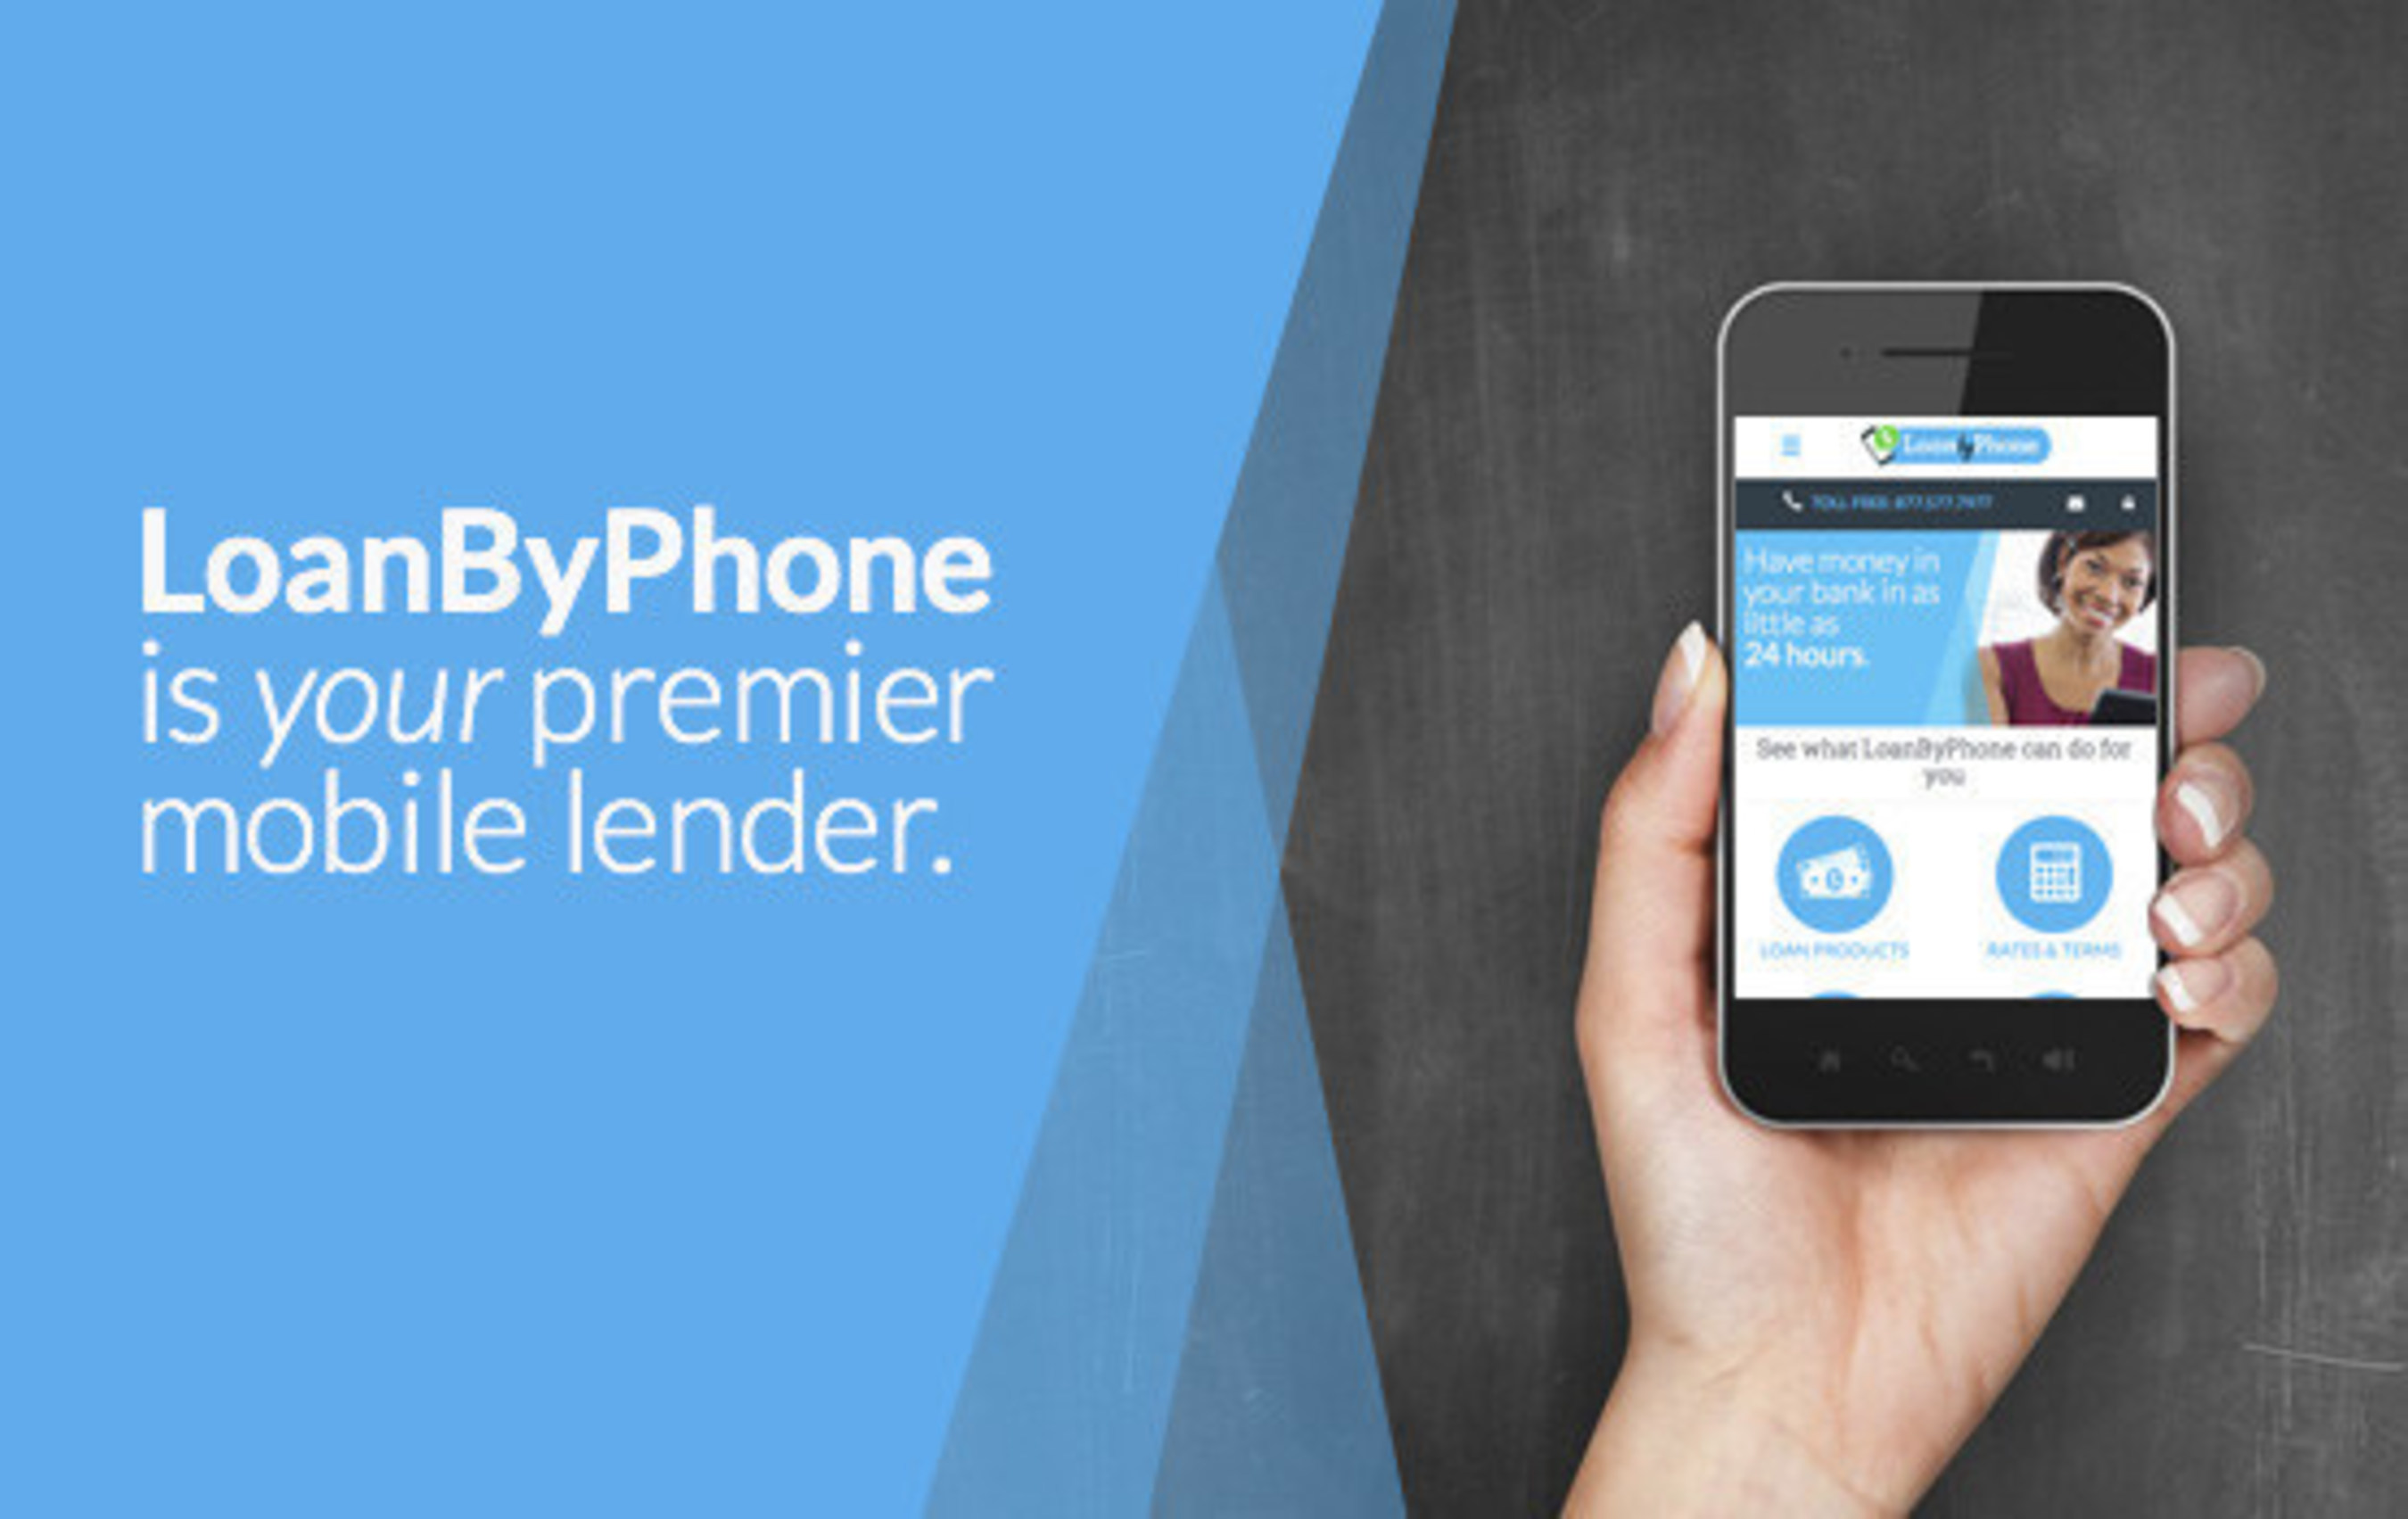 New design makes LoanByPhone.com your premier mobile lender